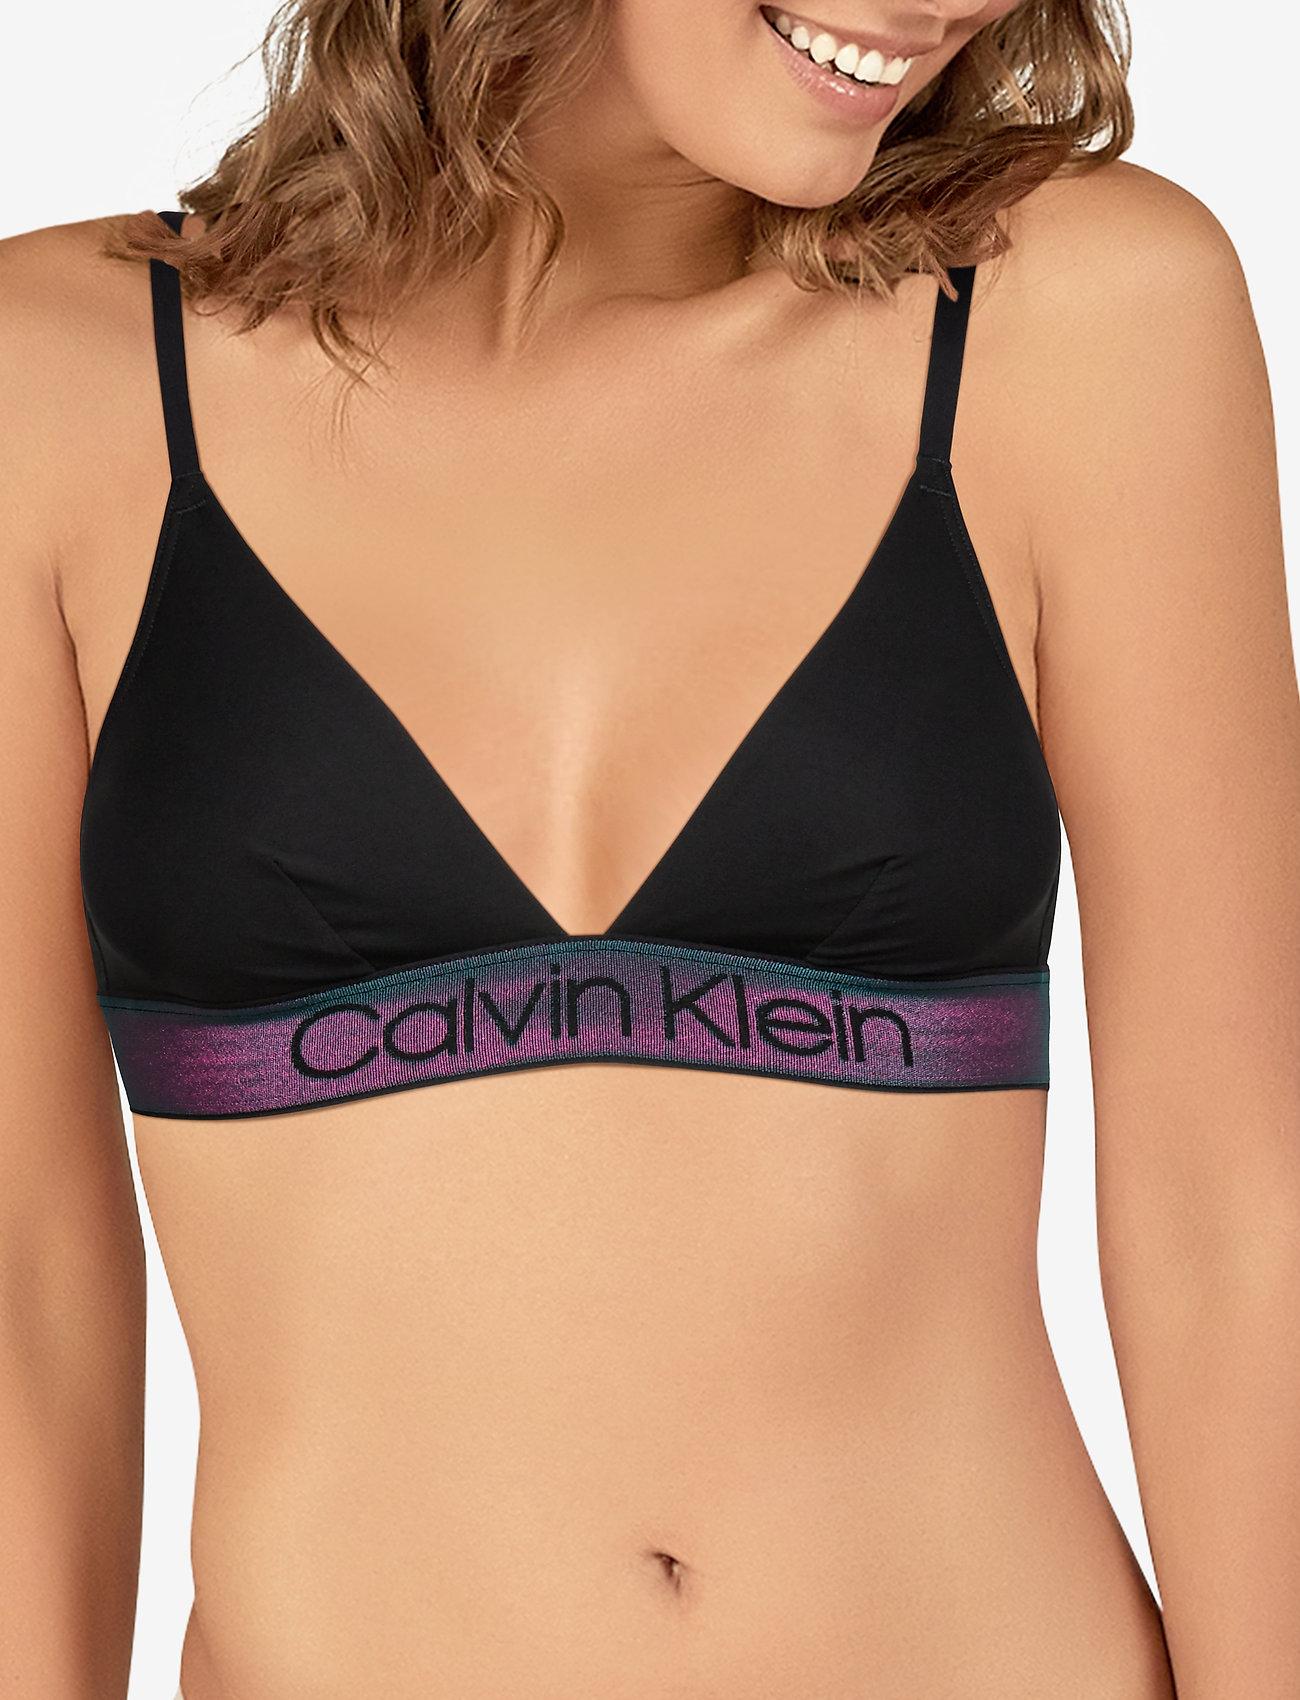 Calvin Klein UNLINED TRIANGLE - BLACK